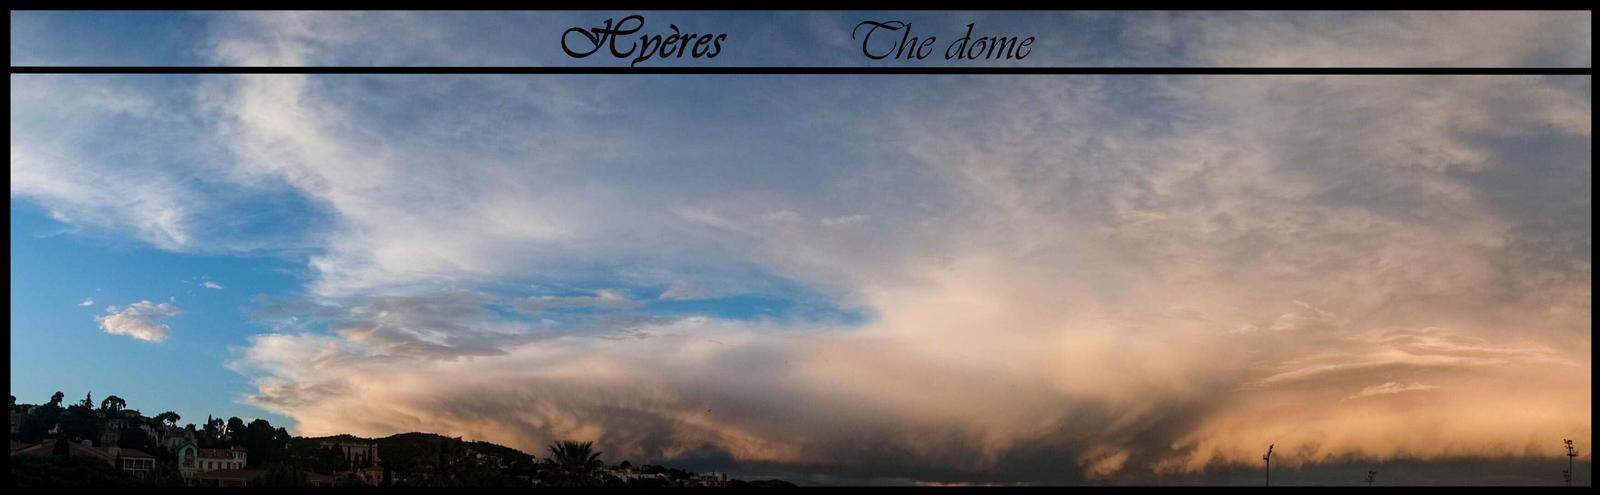 Hyeres' storm by GothxLuciole